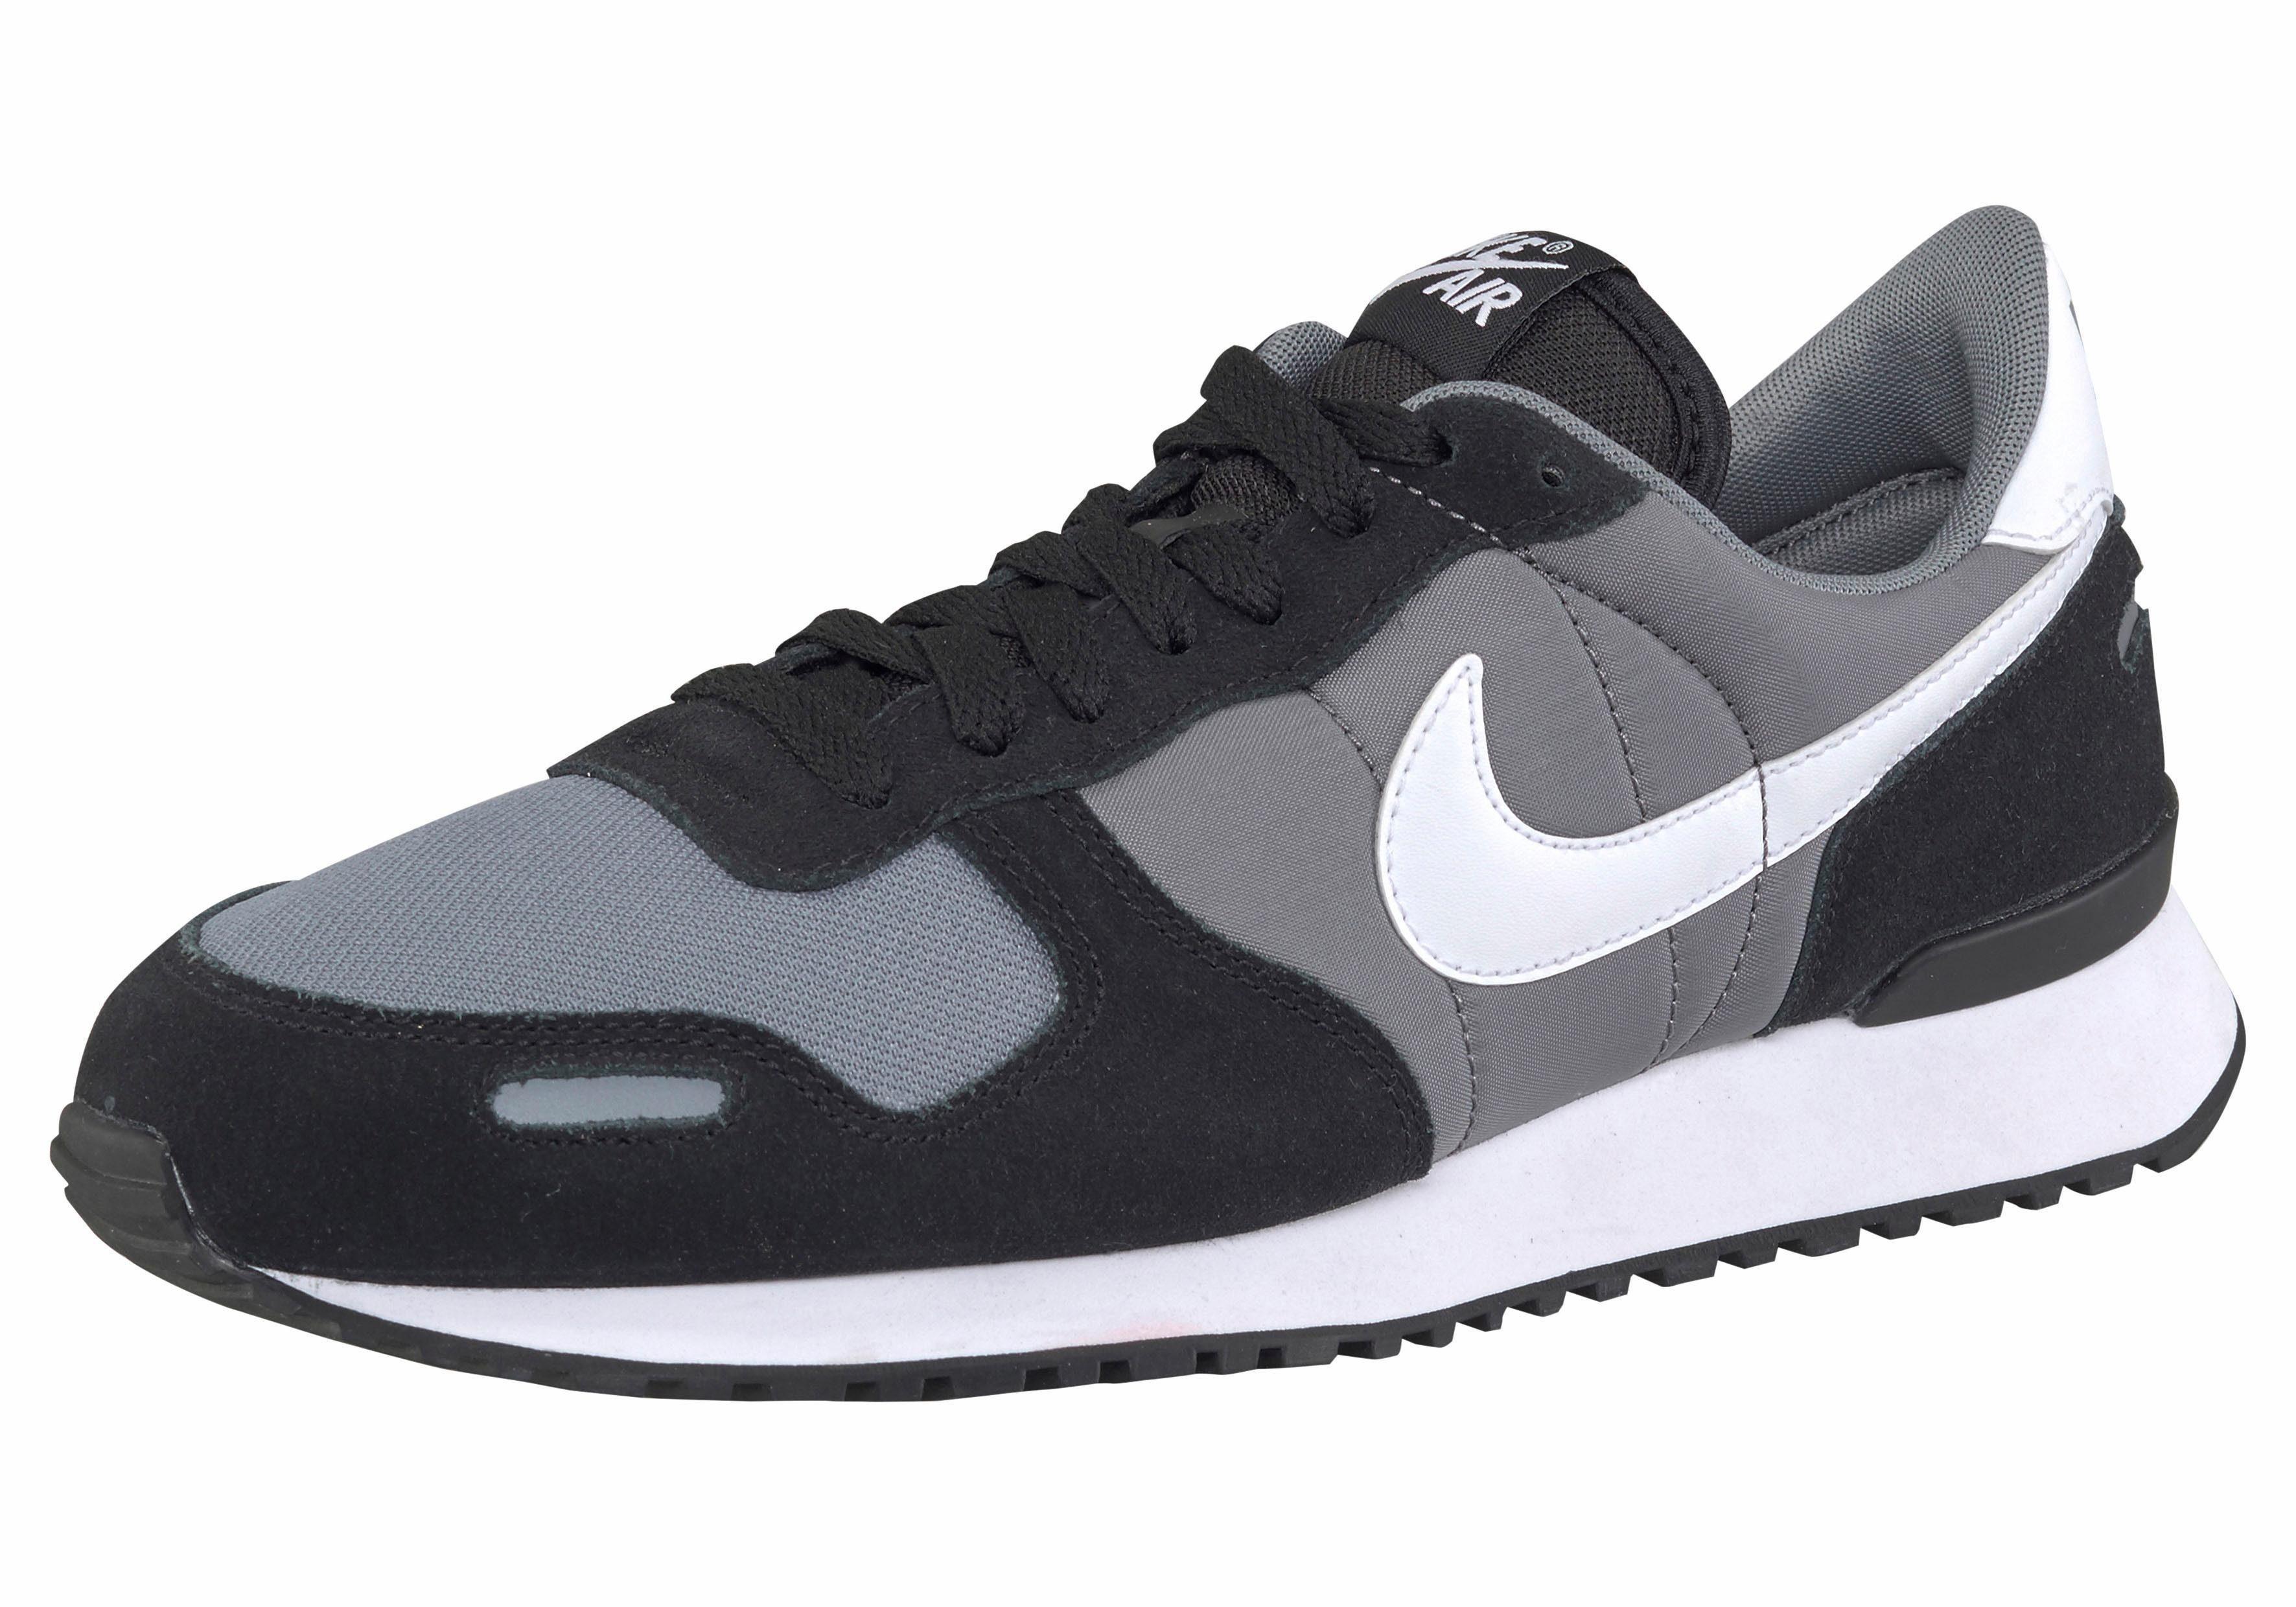 Nike Air Max Thea Sale 2019 Dames & Heren Sneakers Island